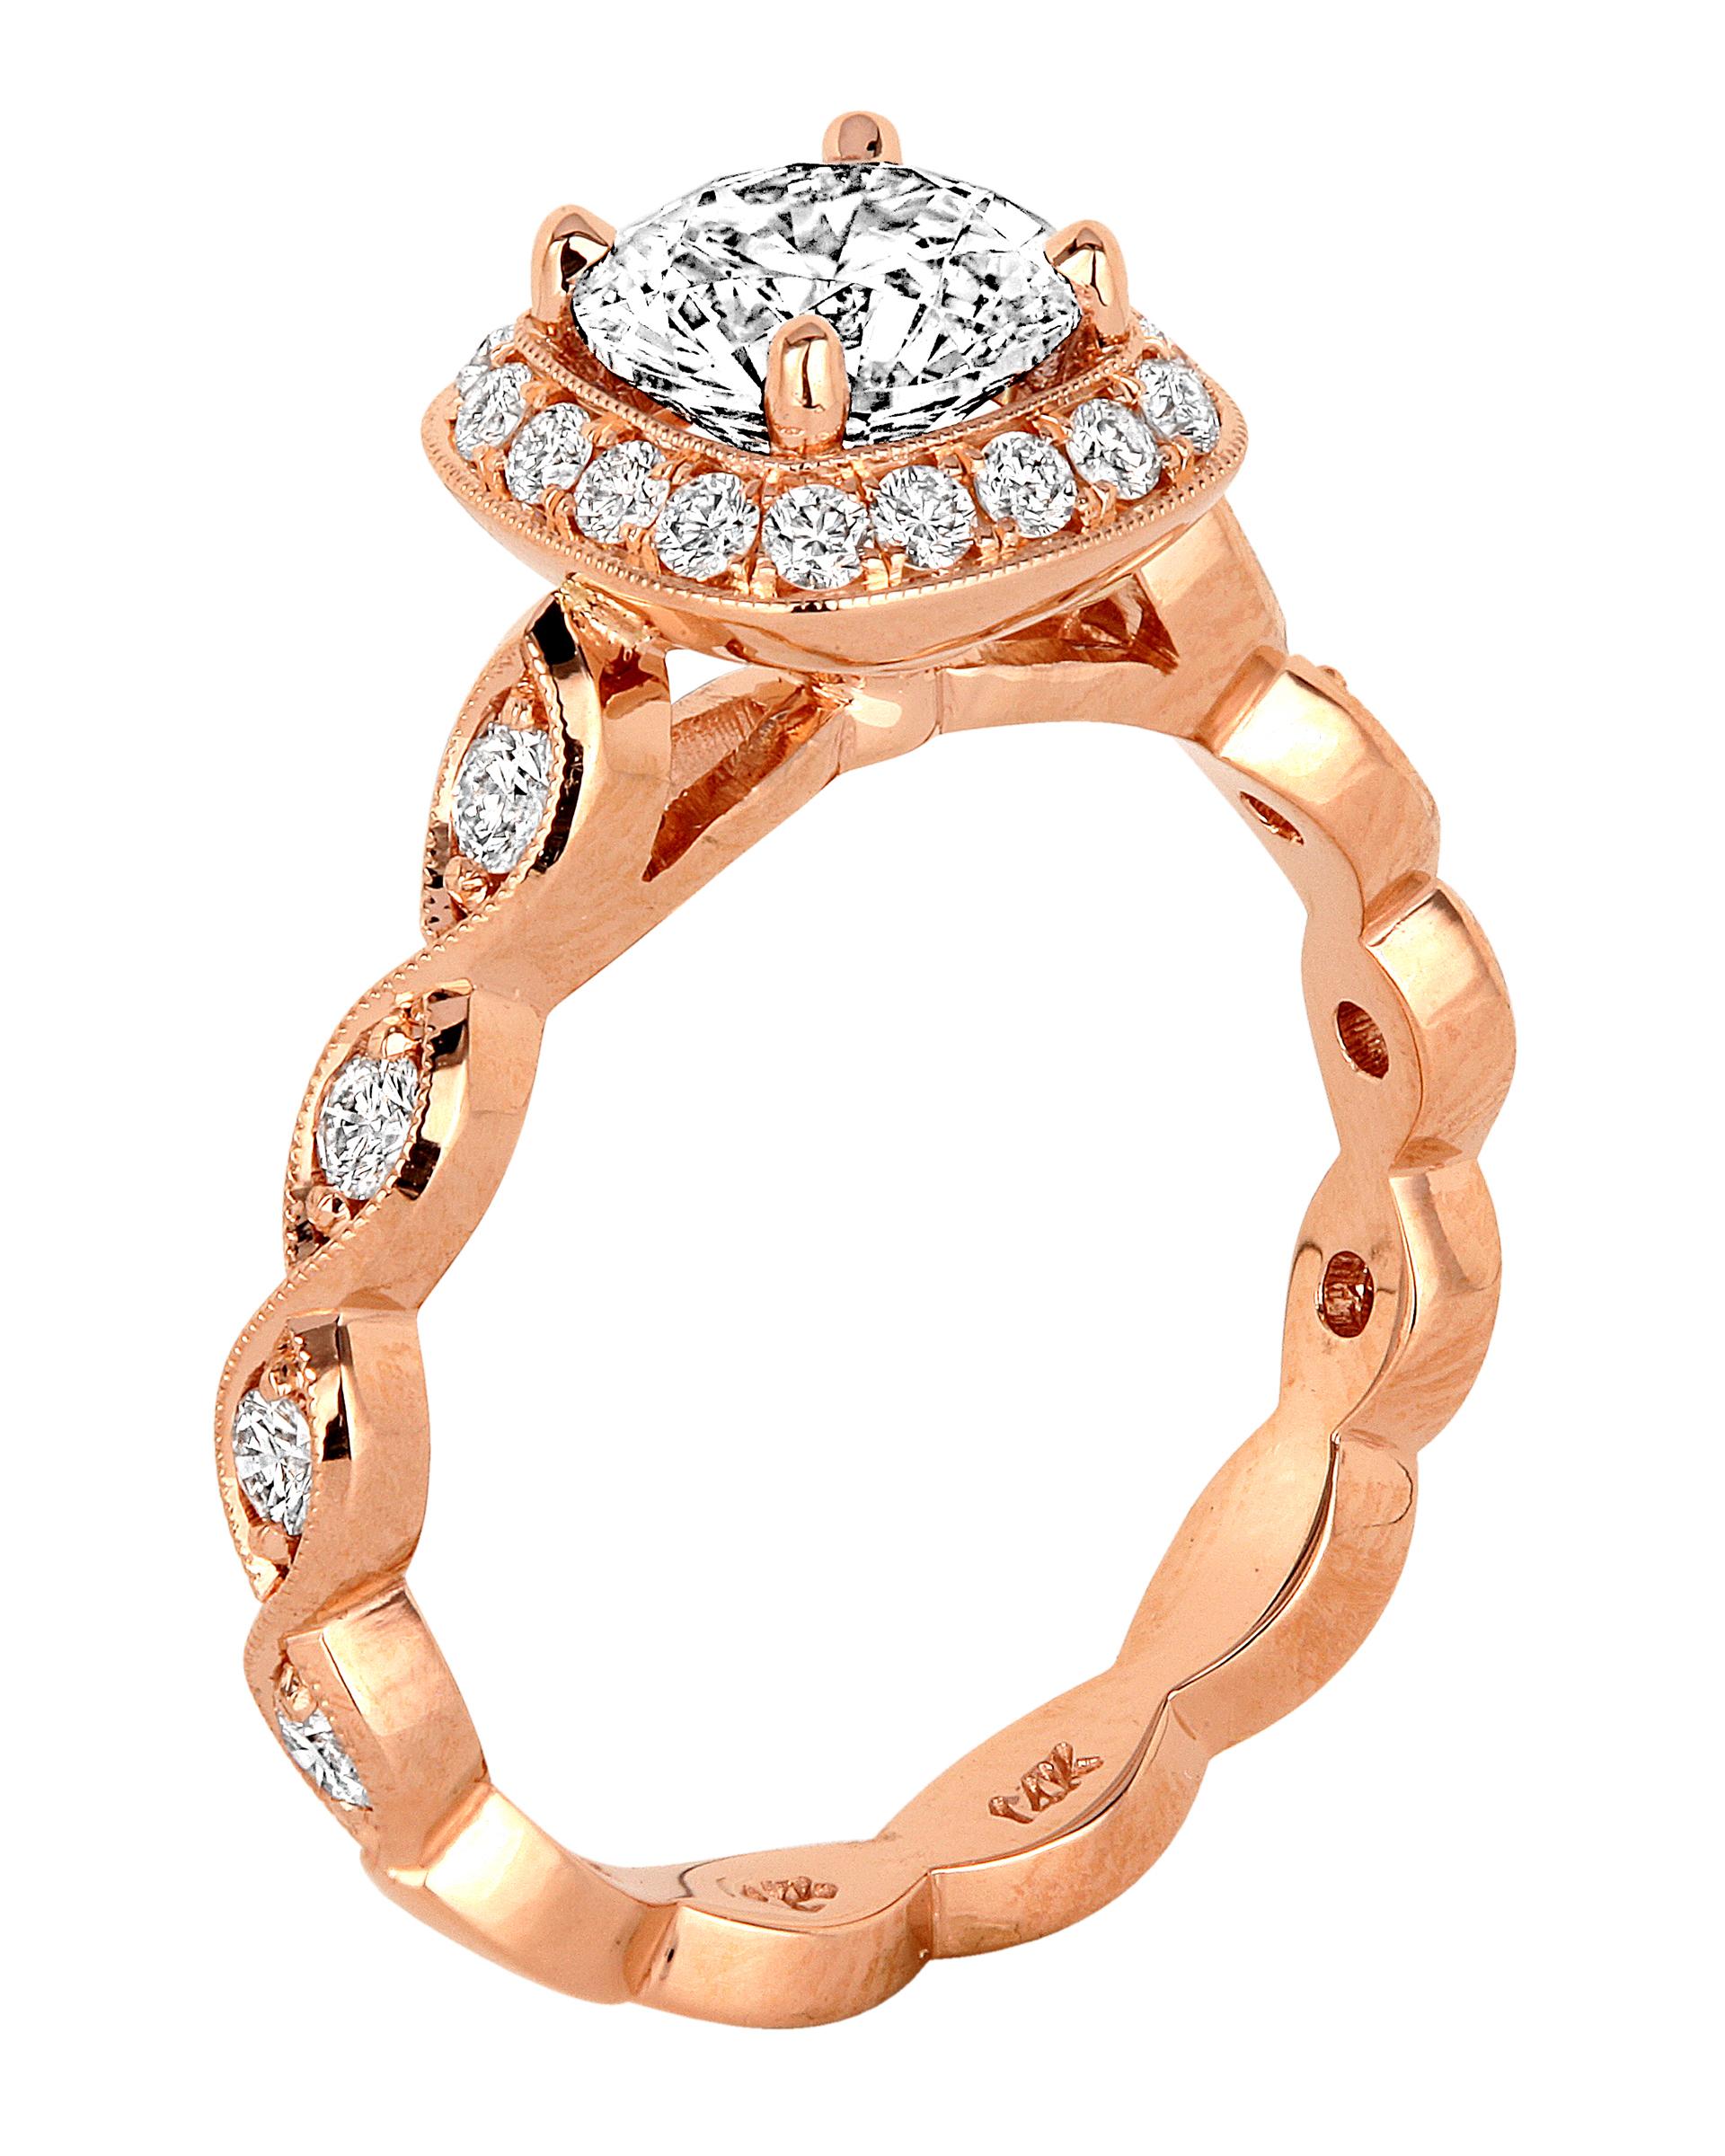 jack-kelege-rose-gold-halo-pave-band-engagment-ring-0816.jpg